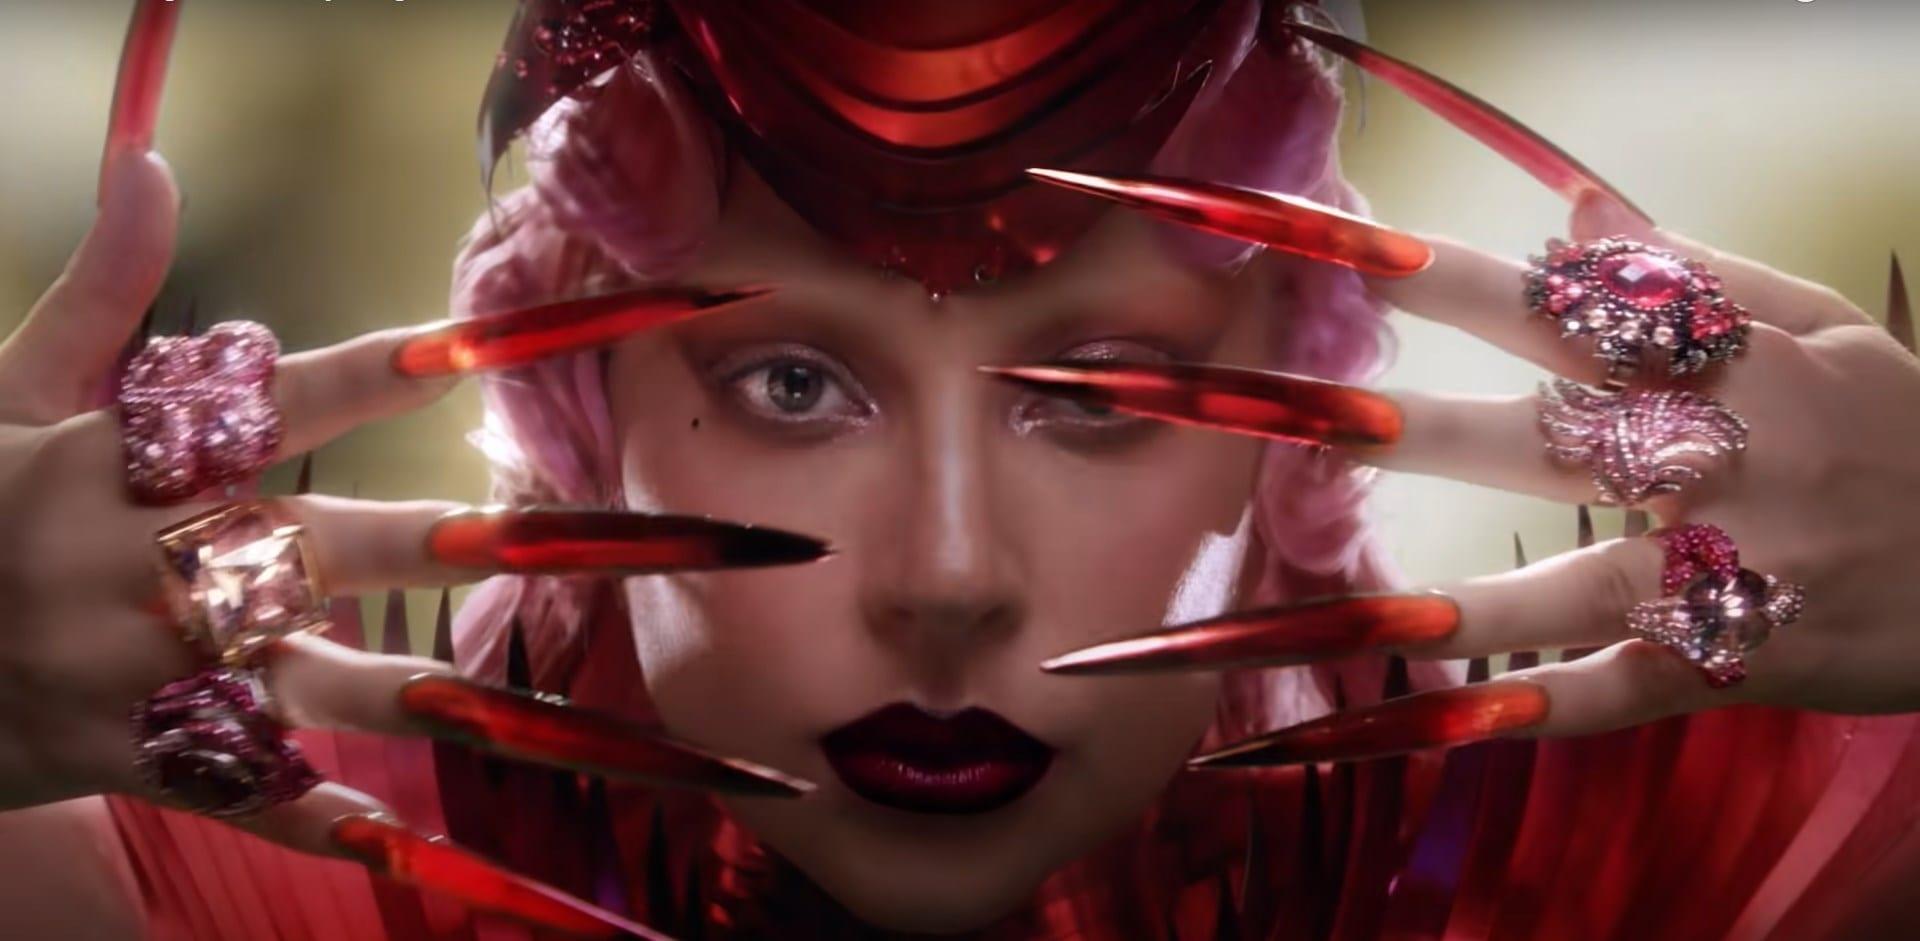 Dom Pérignon Lady Gaga advert